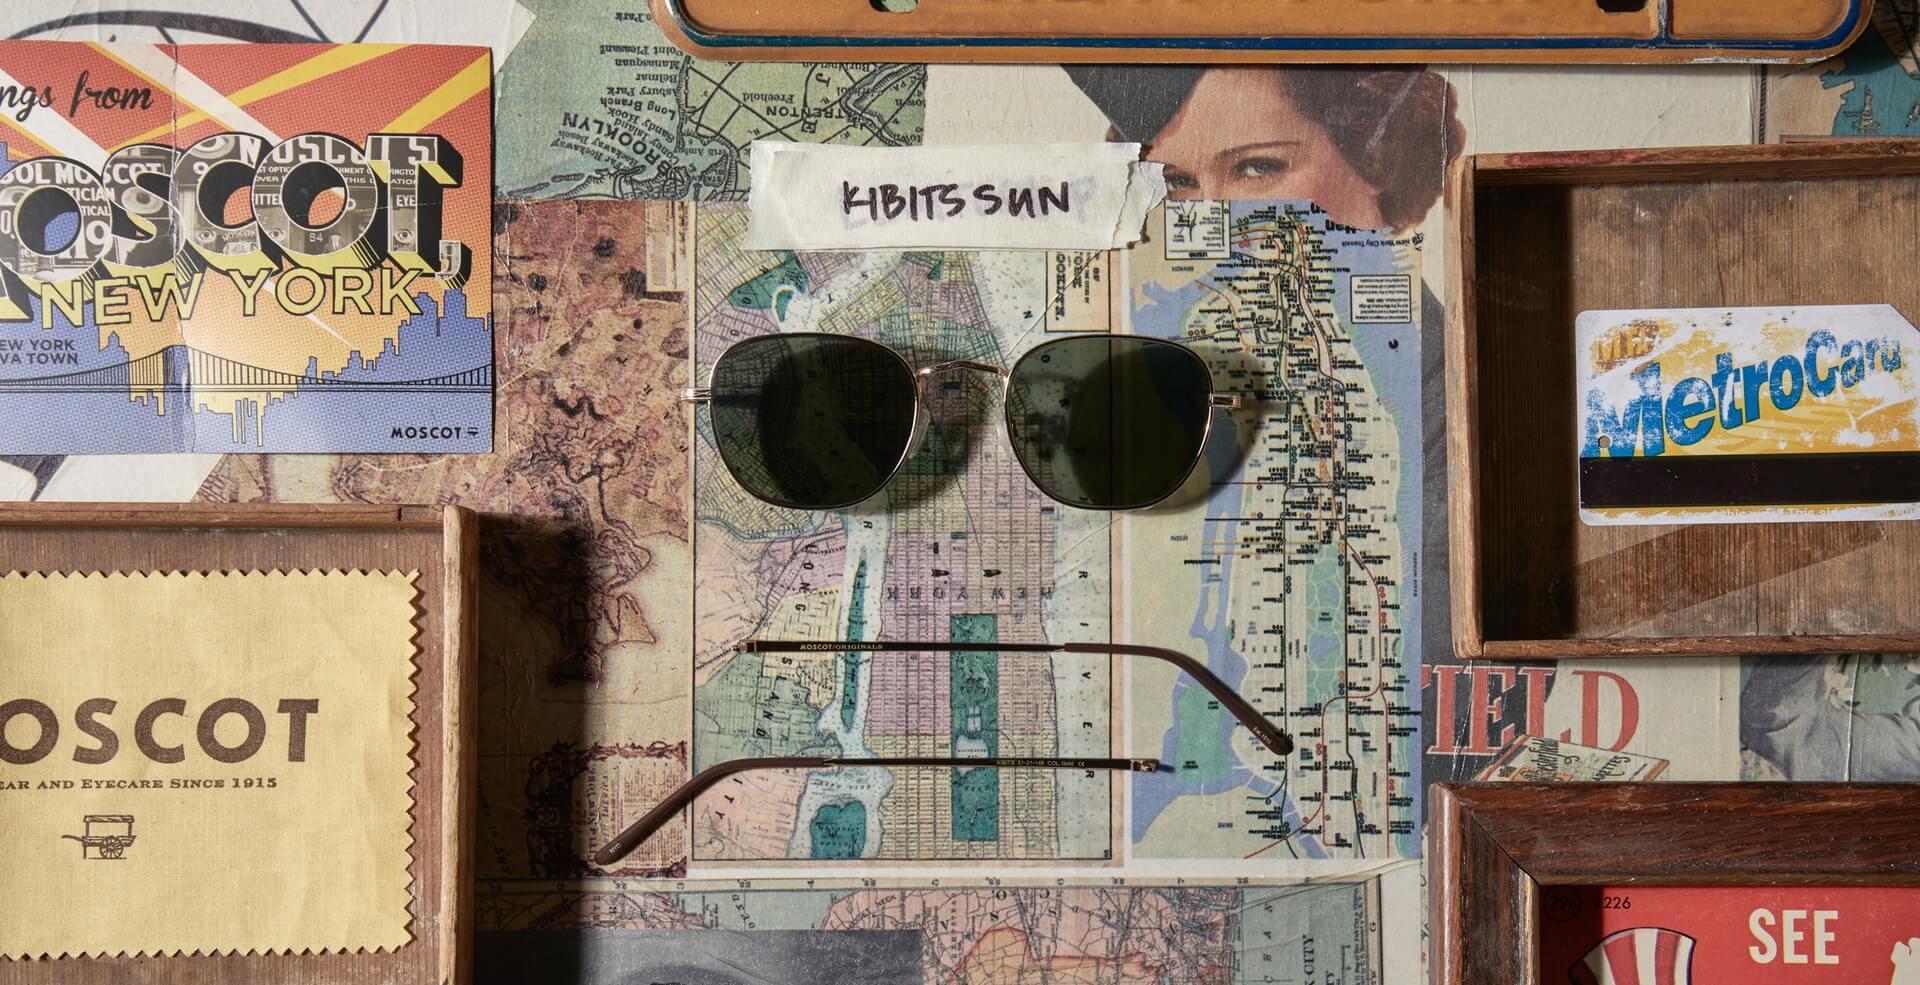 KIBITS SUN